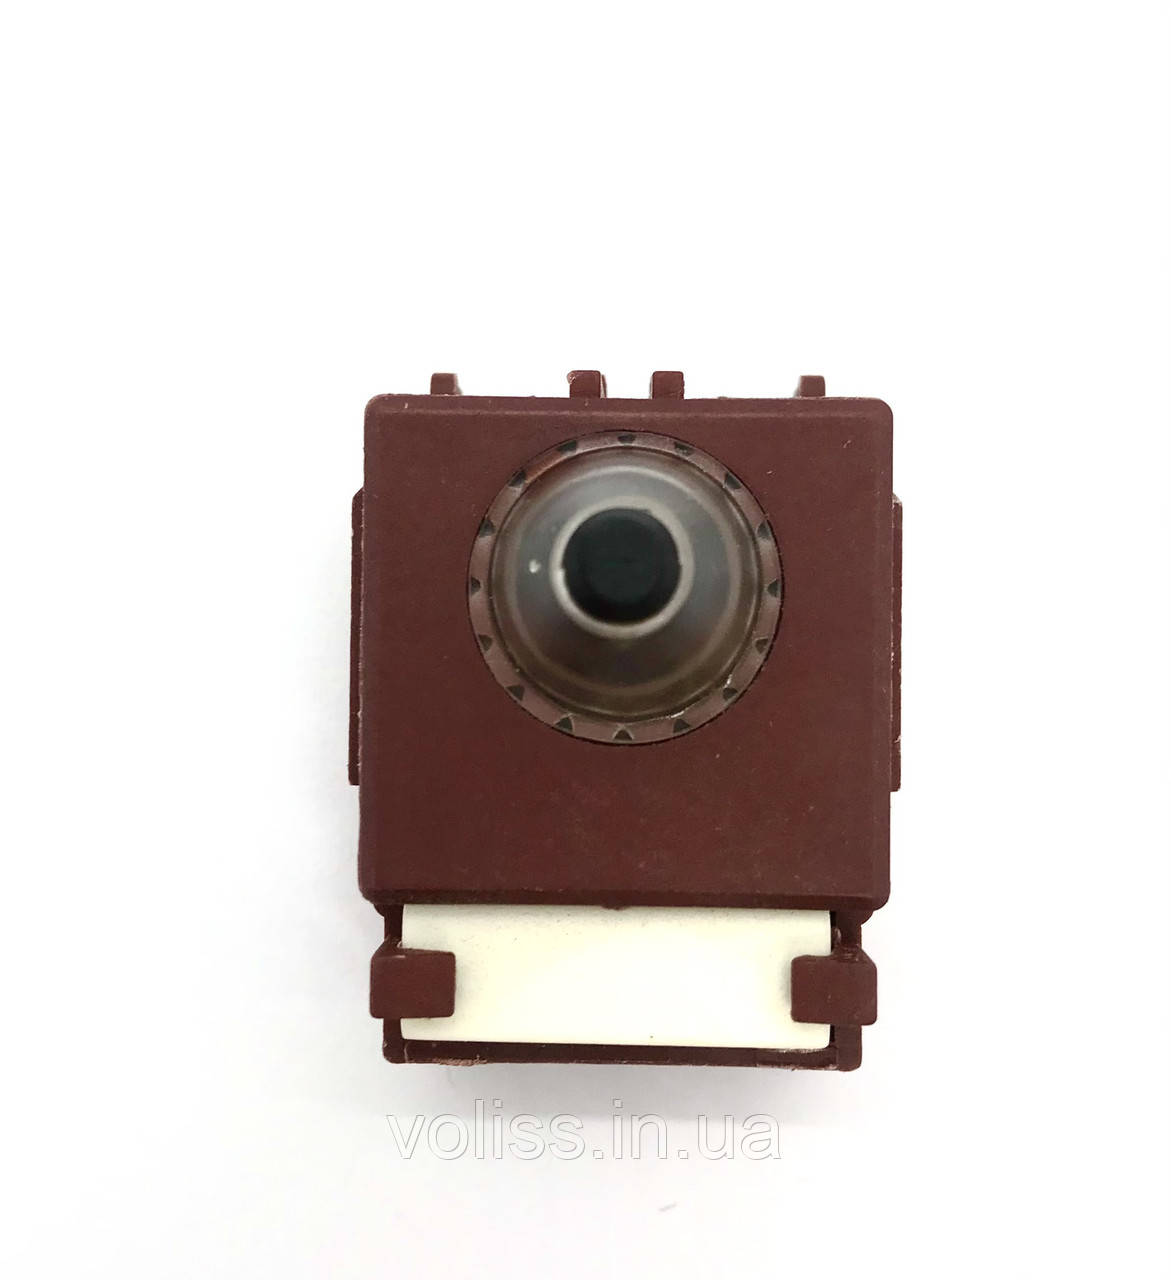 Кнопка на УШМ Ø115-125 (Фиолент, Stern) кн37